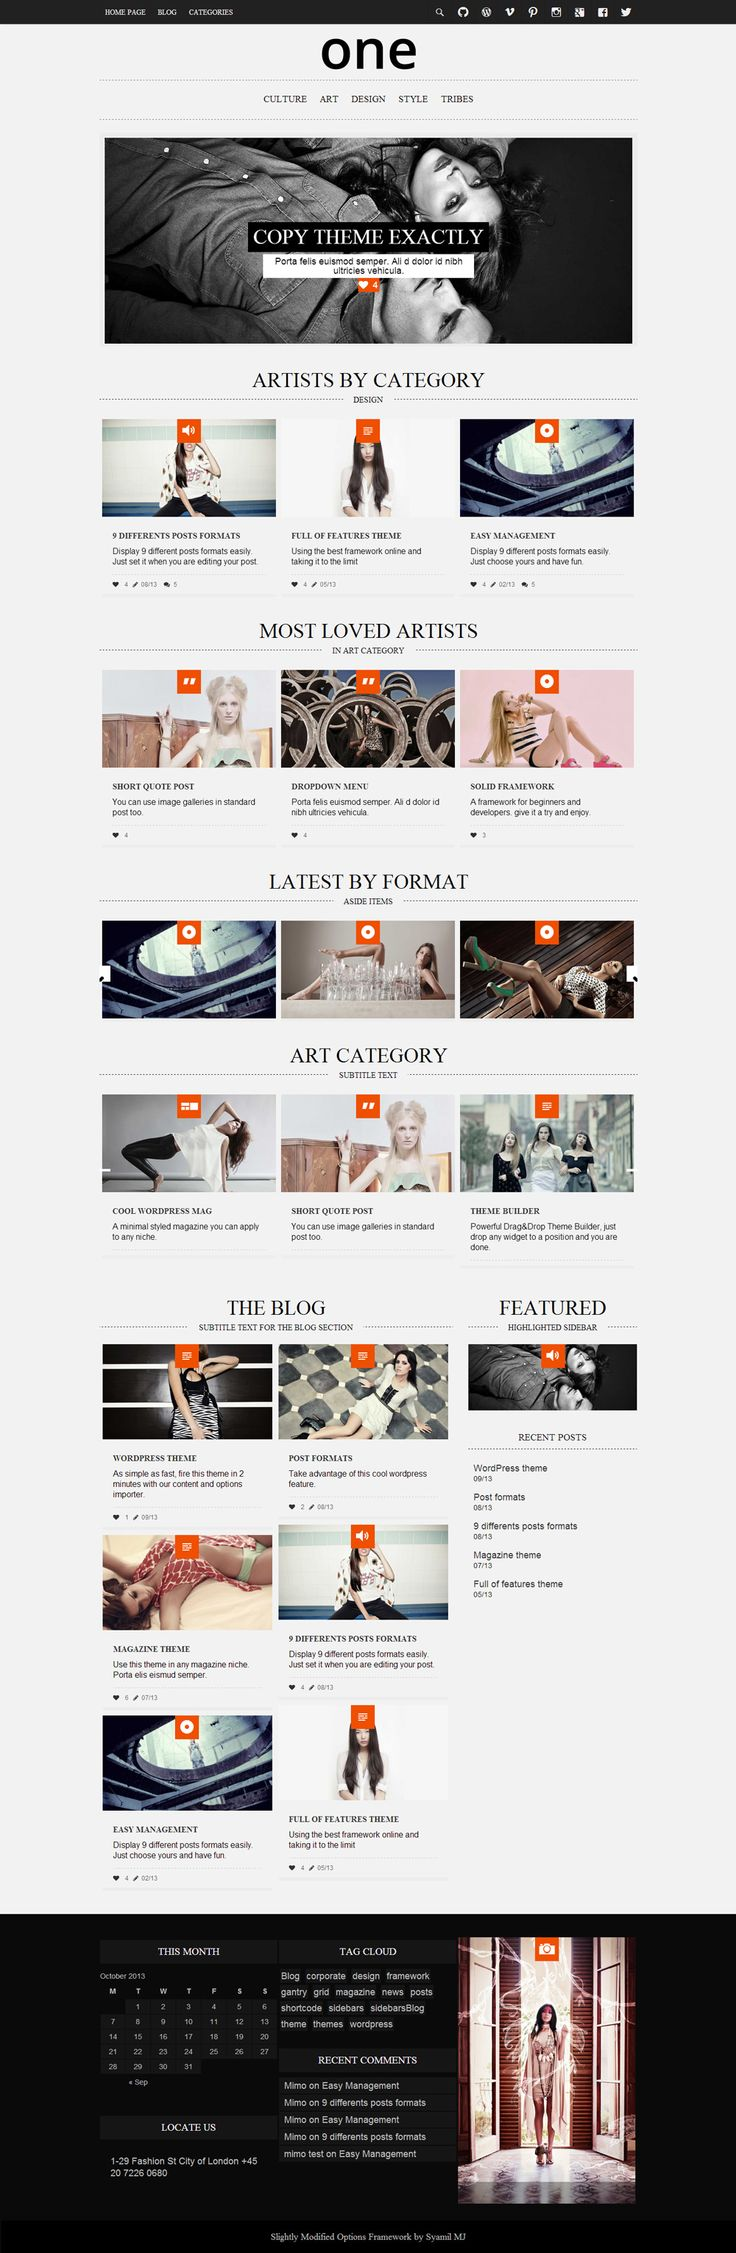 Responsive Web Design Wordpress Theme Find More On The Responsive